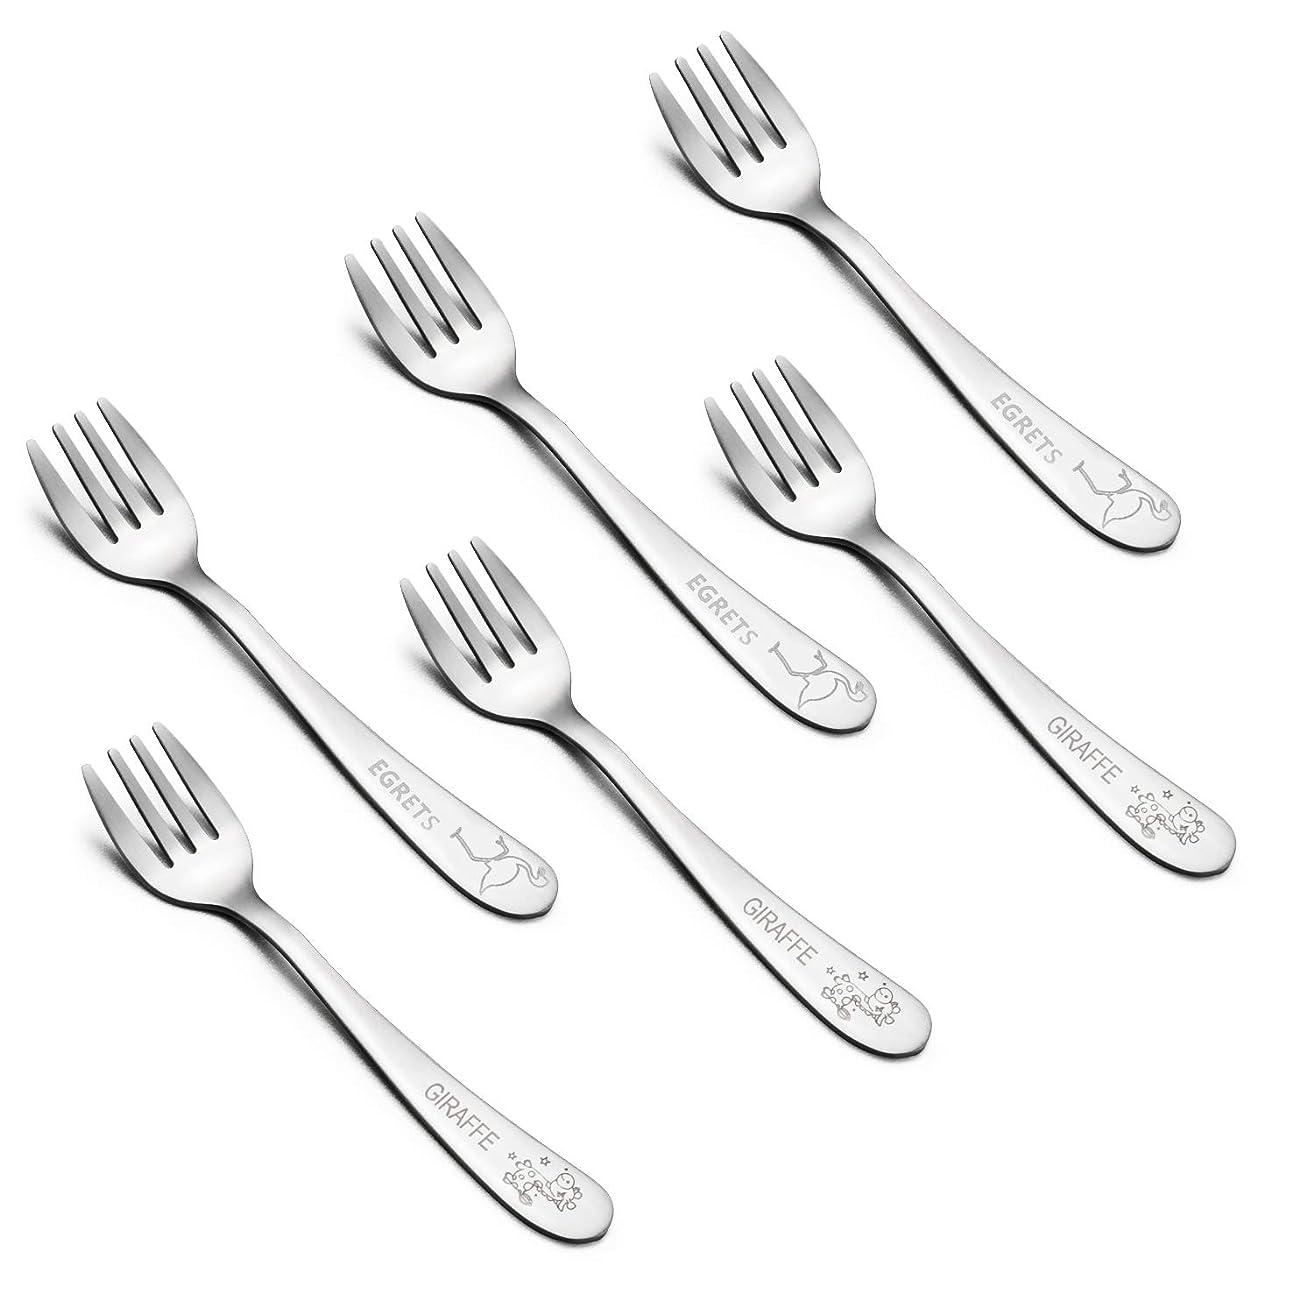 Kids Forks, E-far Stainless Steel Toddler Baby Fork Set, BPA Free & Cute Animals Pattern, Matte Polished & Dishwasher Safe - 6 Pack